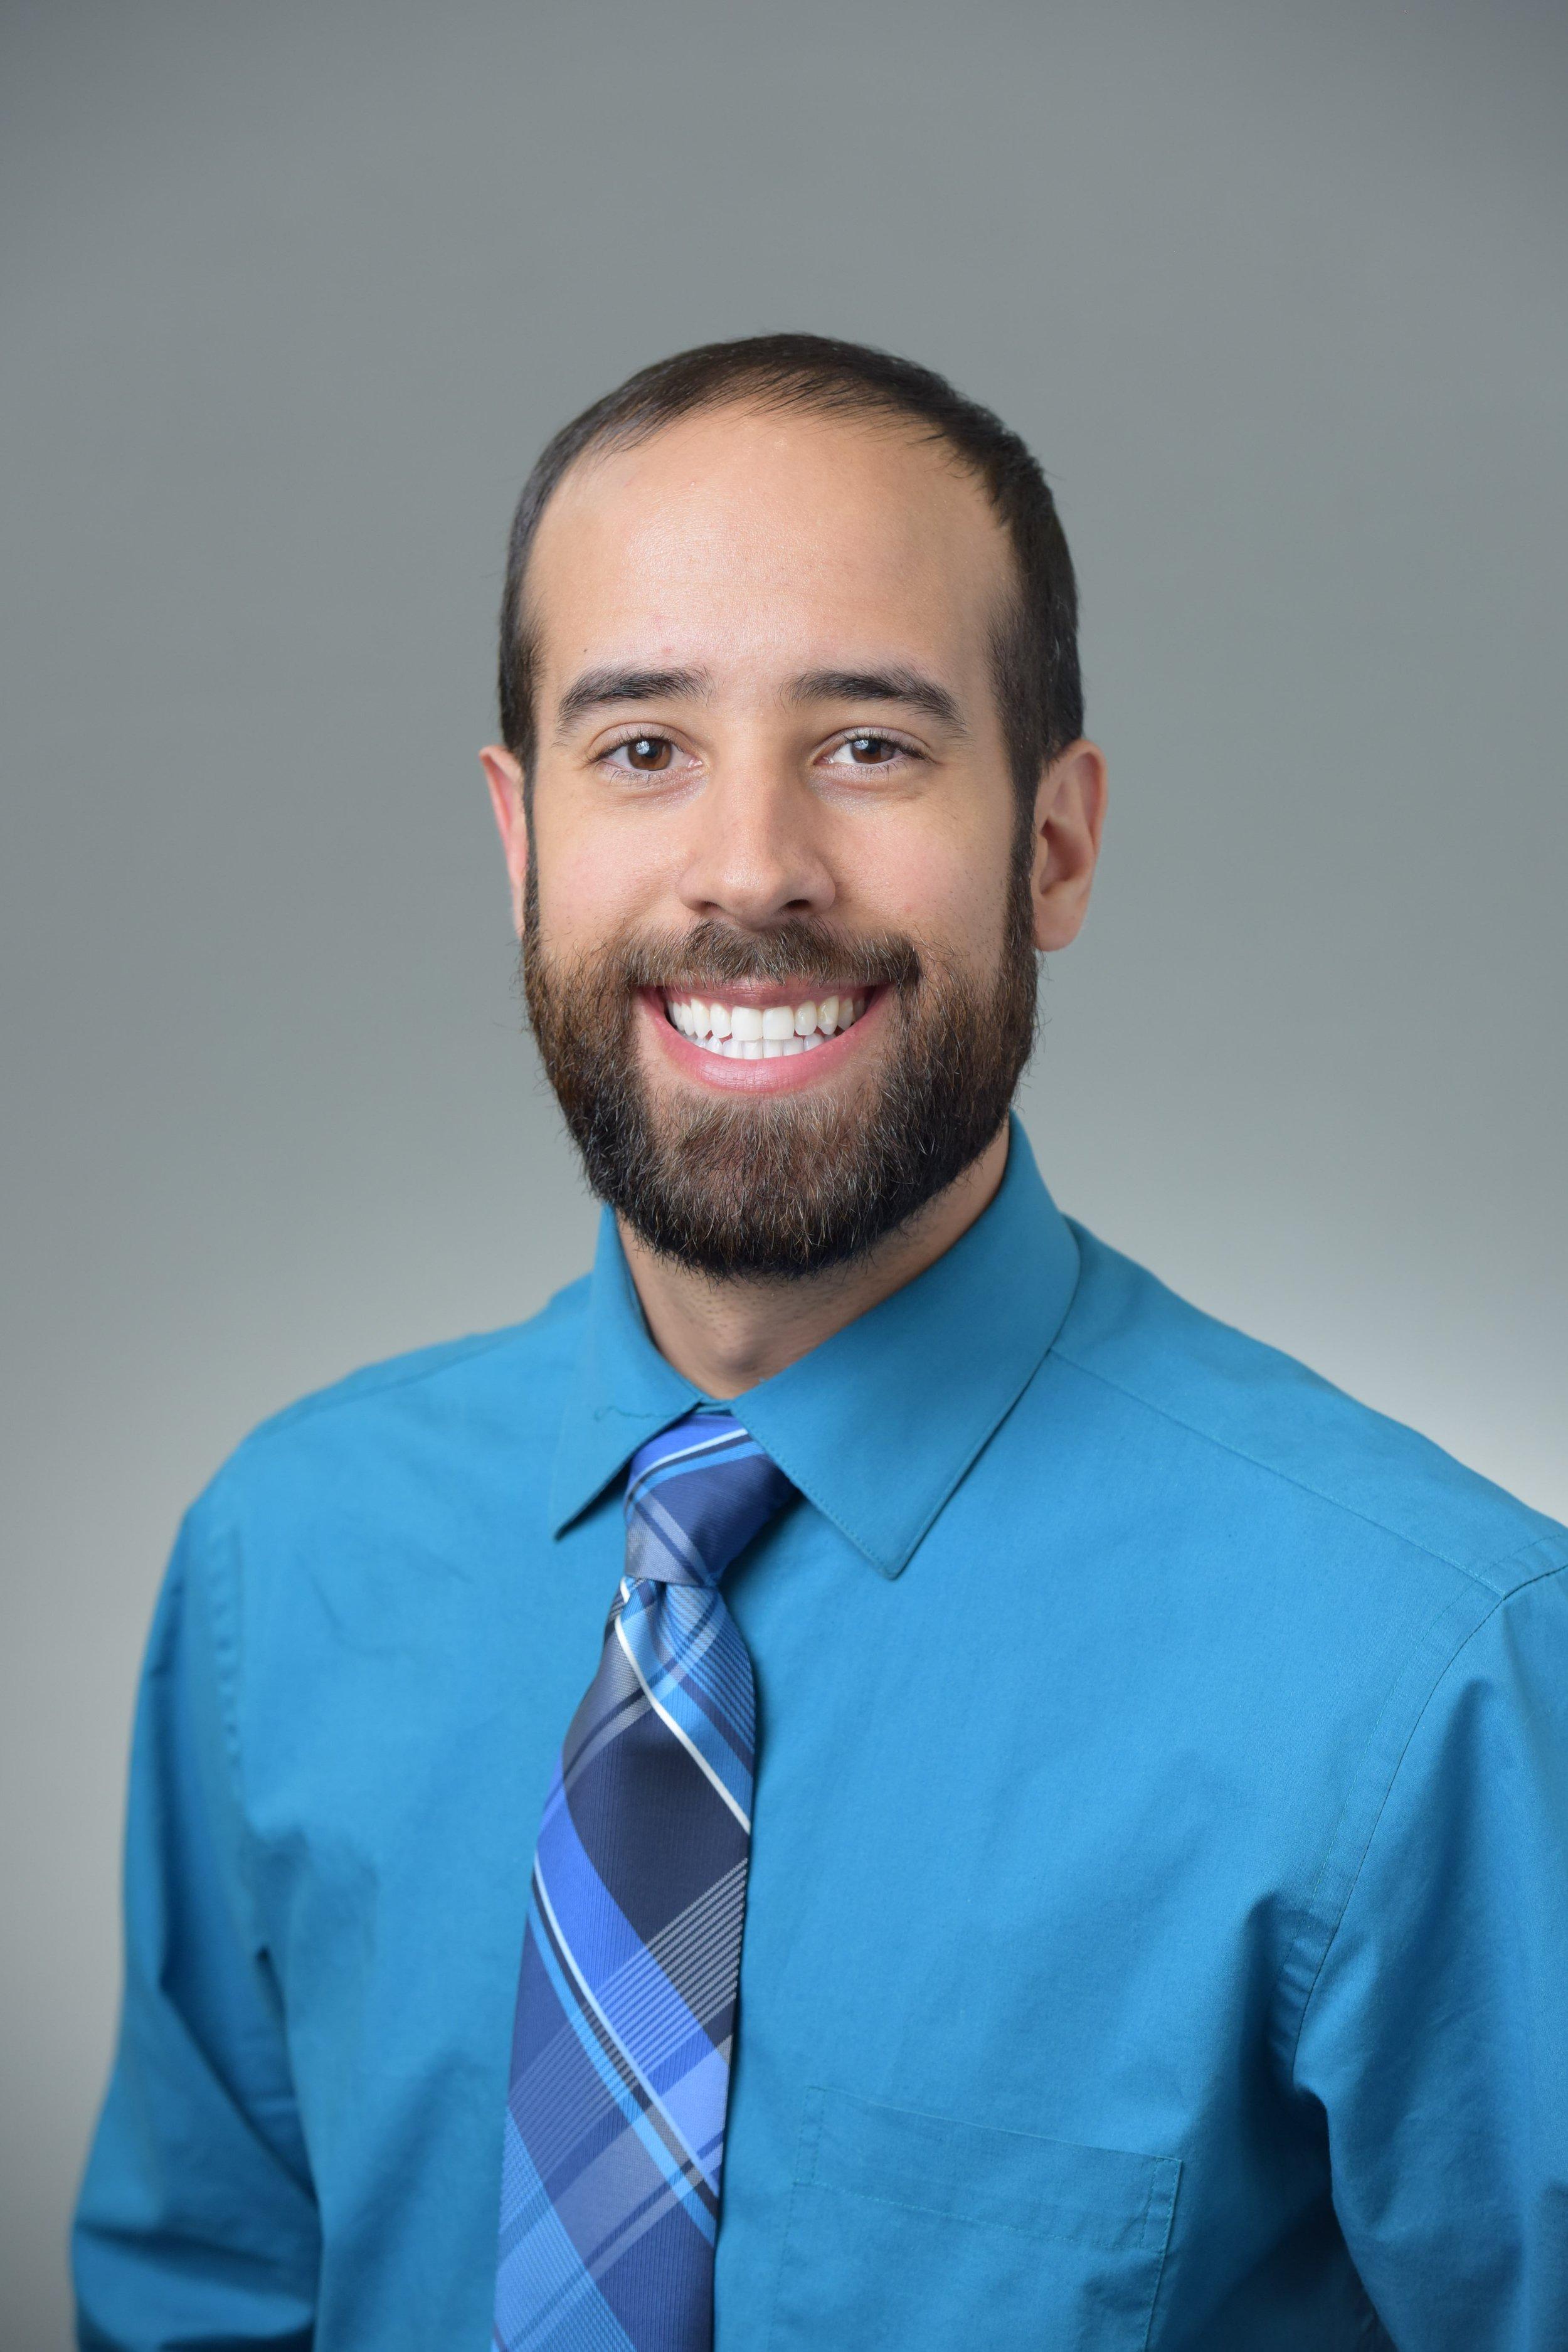 Dr. Paul Photo.JPG